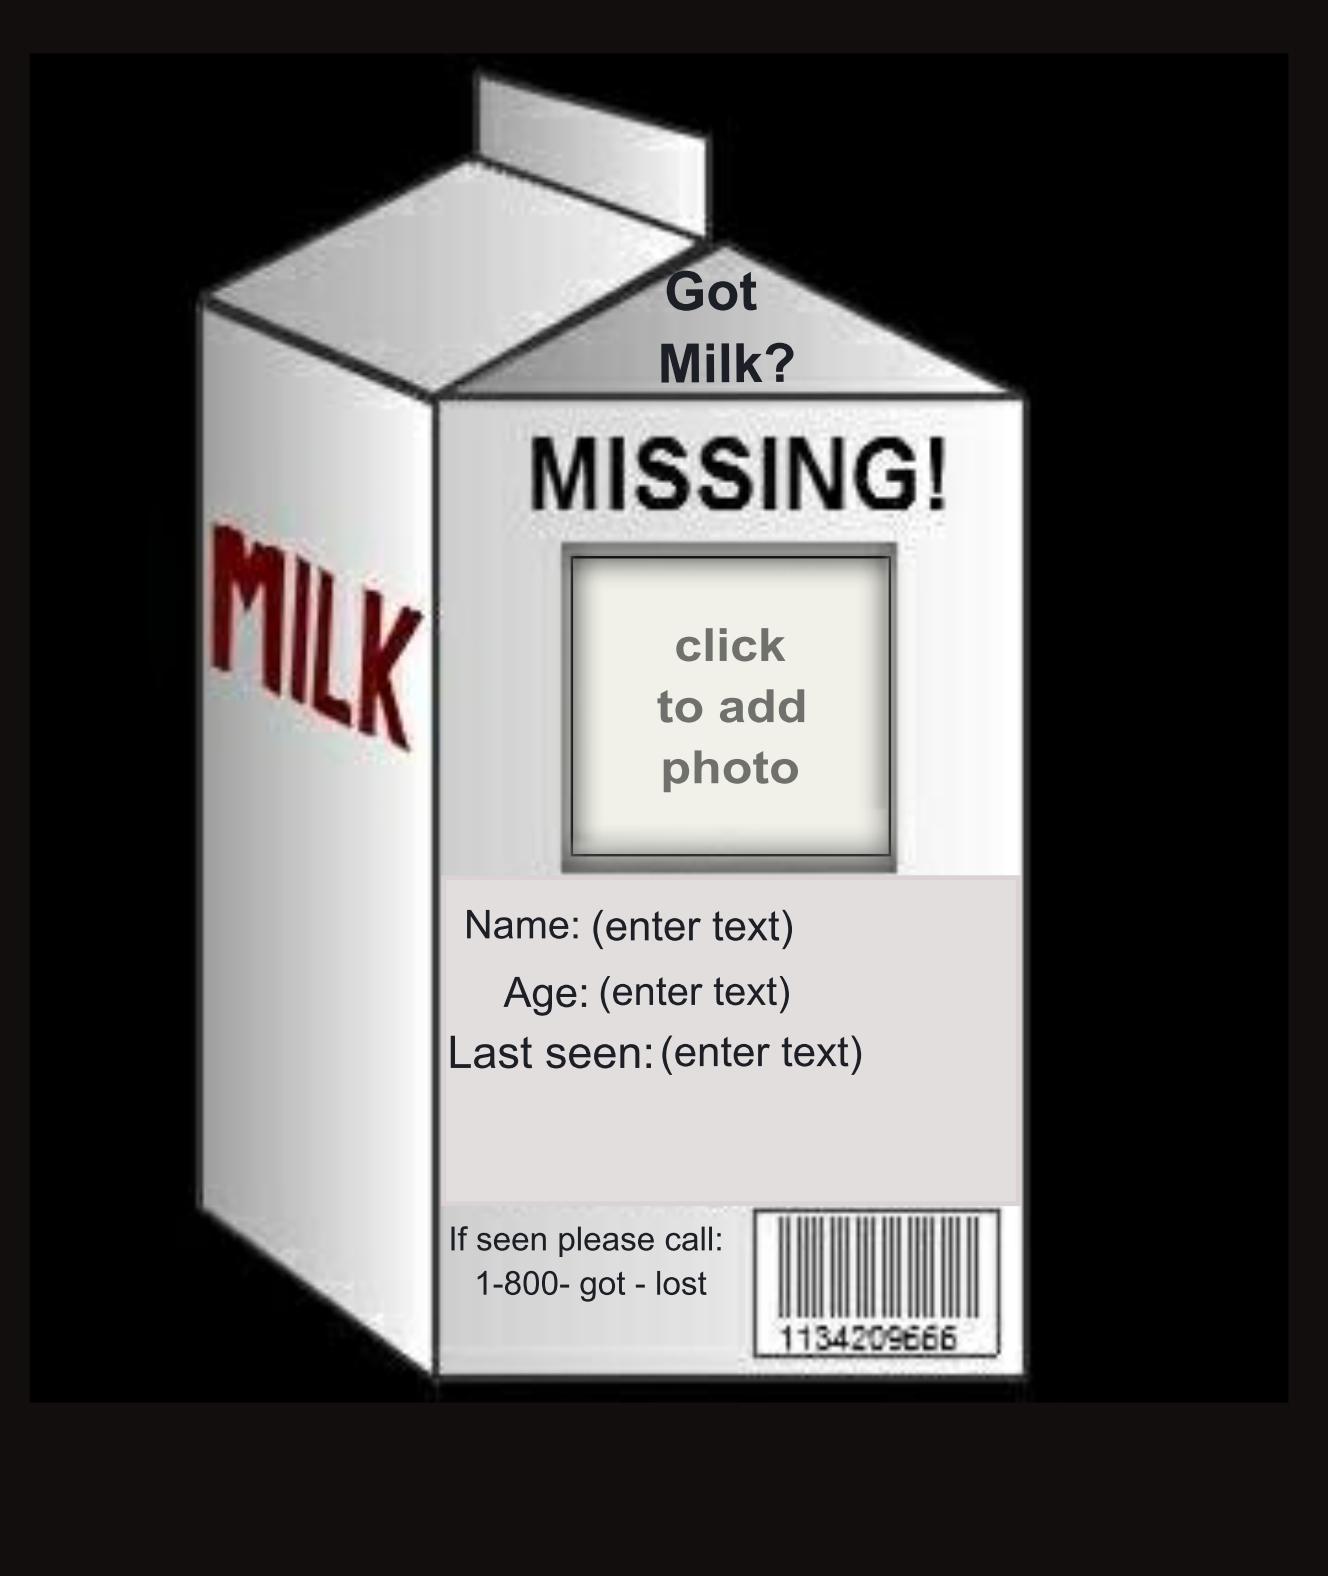 Milk carton missing template